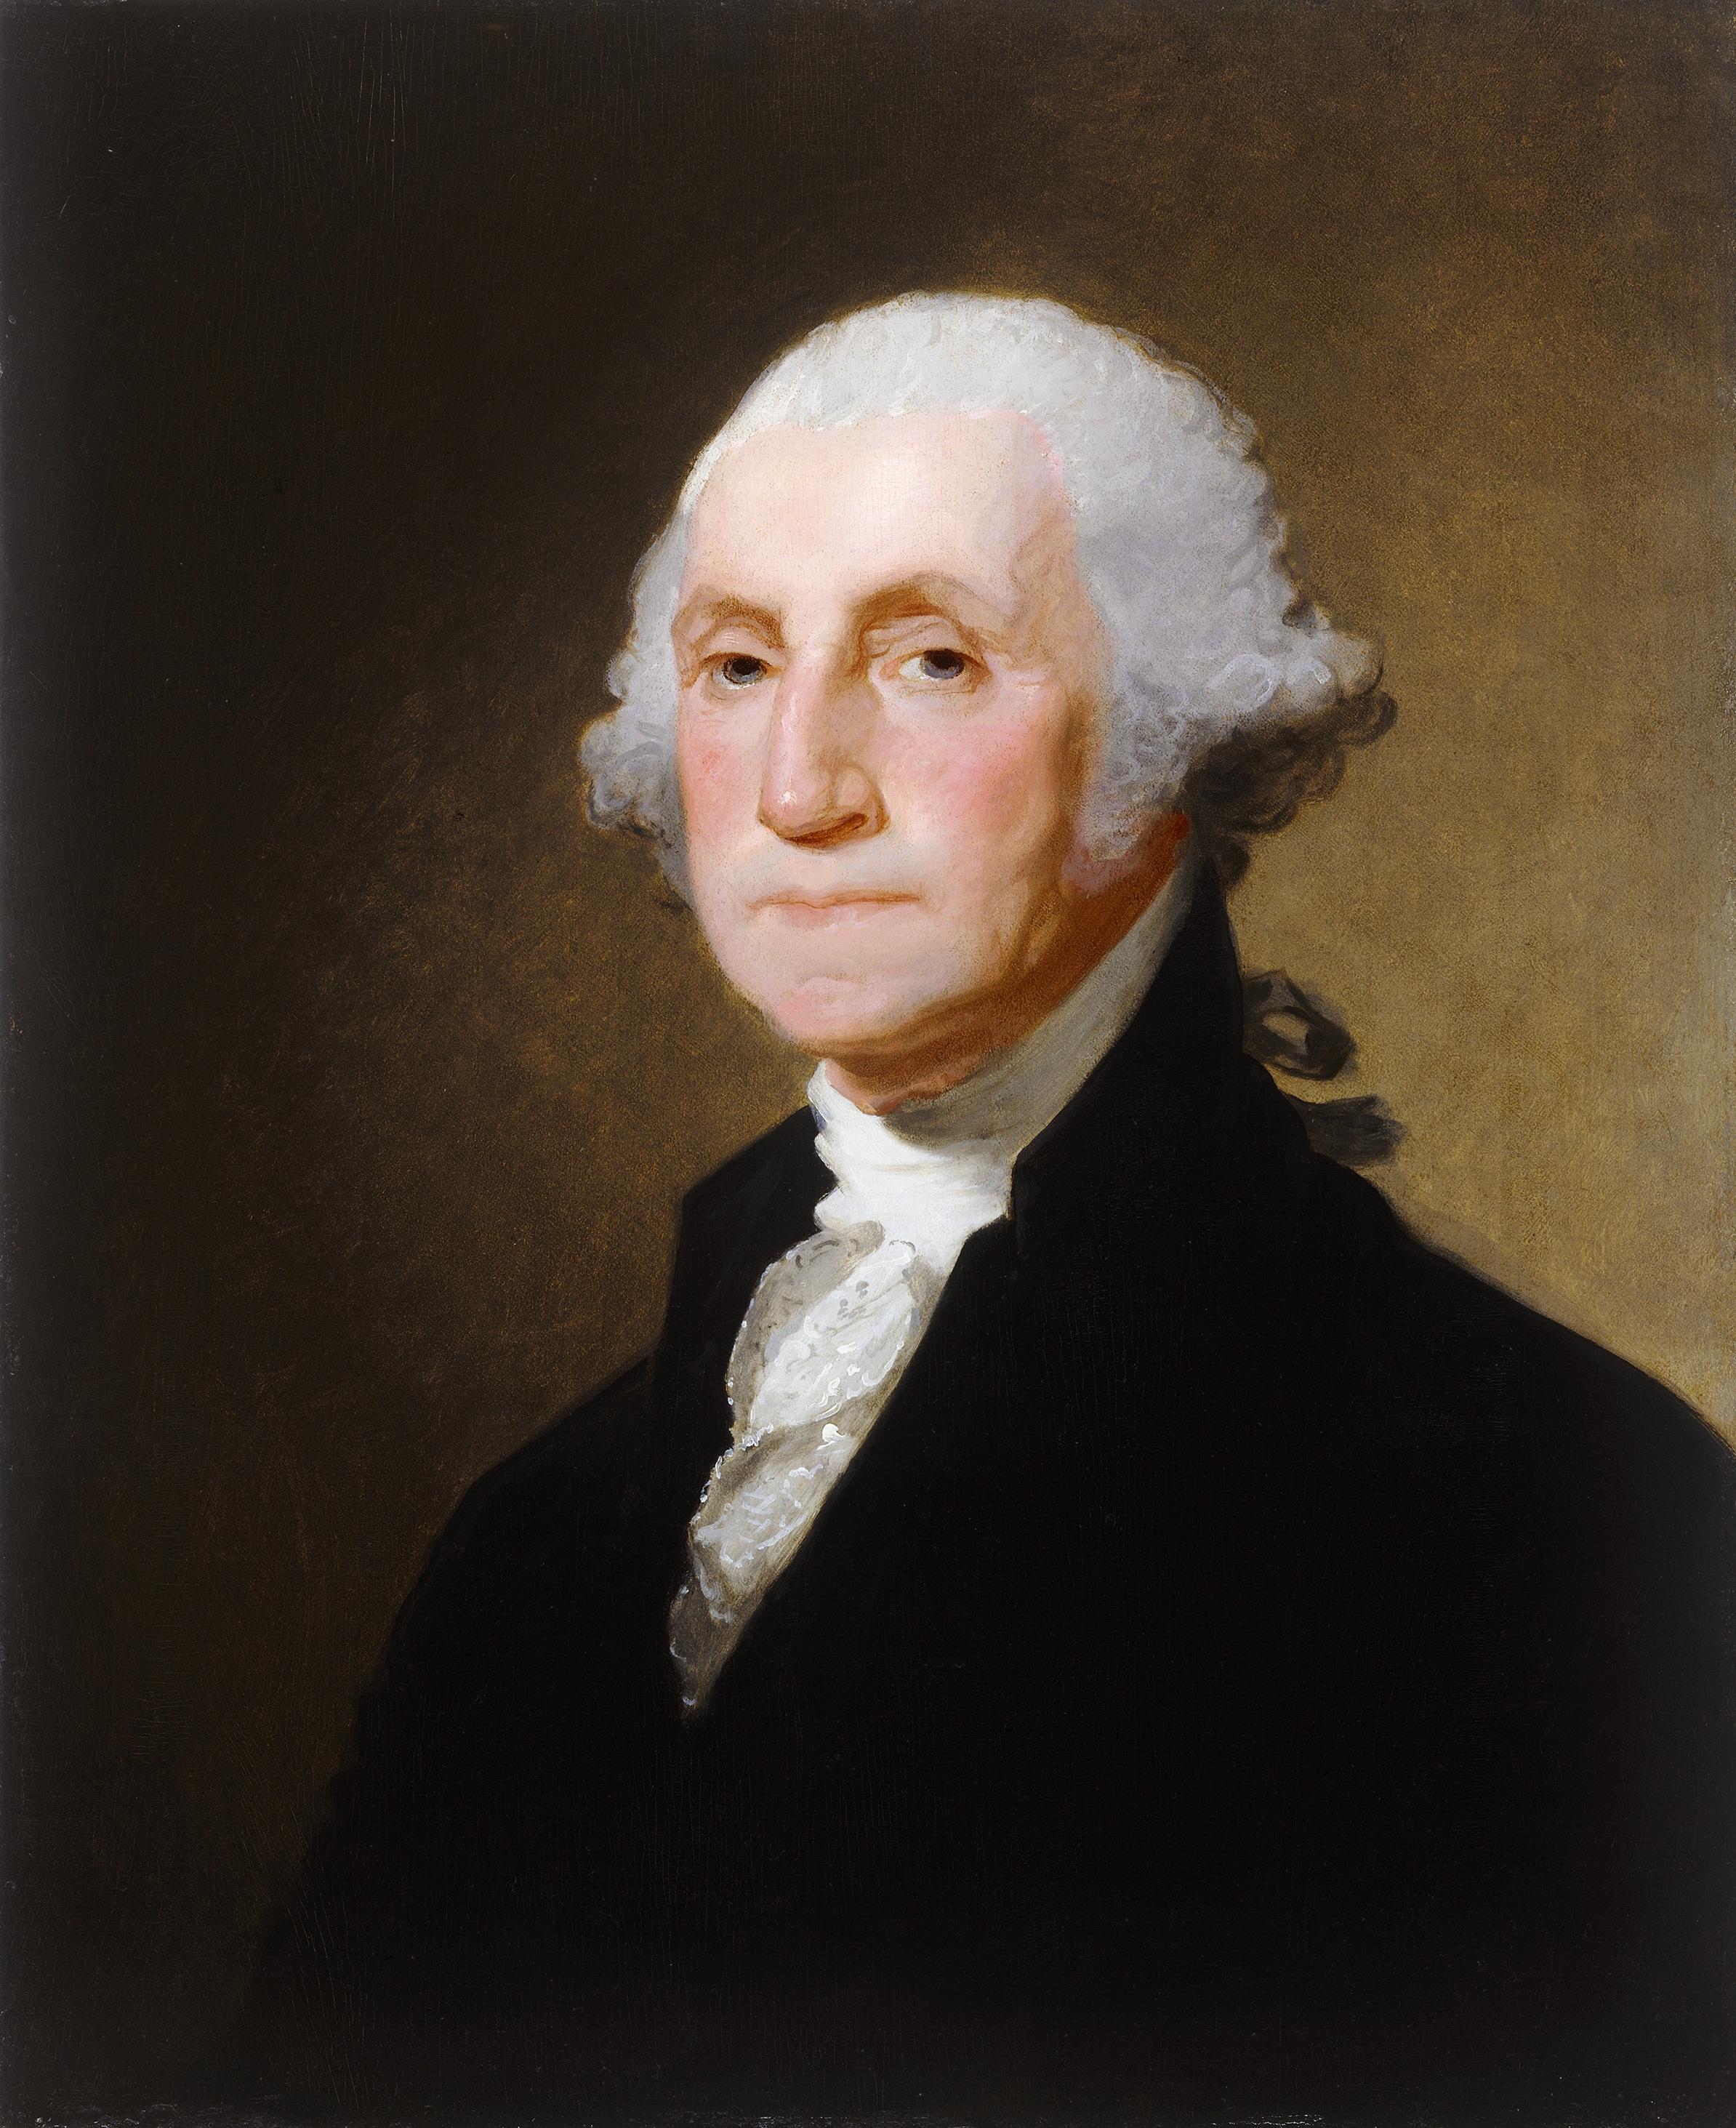 George_Washington_-_by_Gilbert_Stuart_-_c._1821_-_National_Gallery_of_Art,_Washington_DC